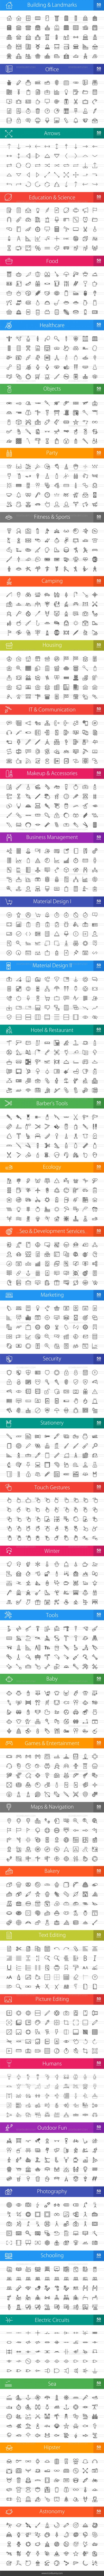 2010 Line Icons Bundle - Preview - IconBunny